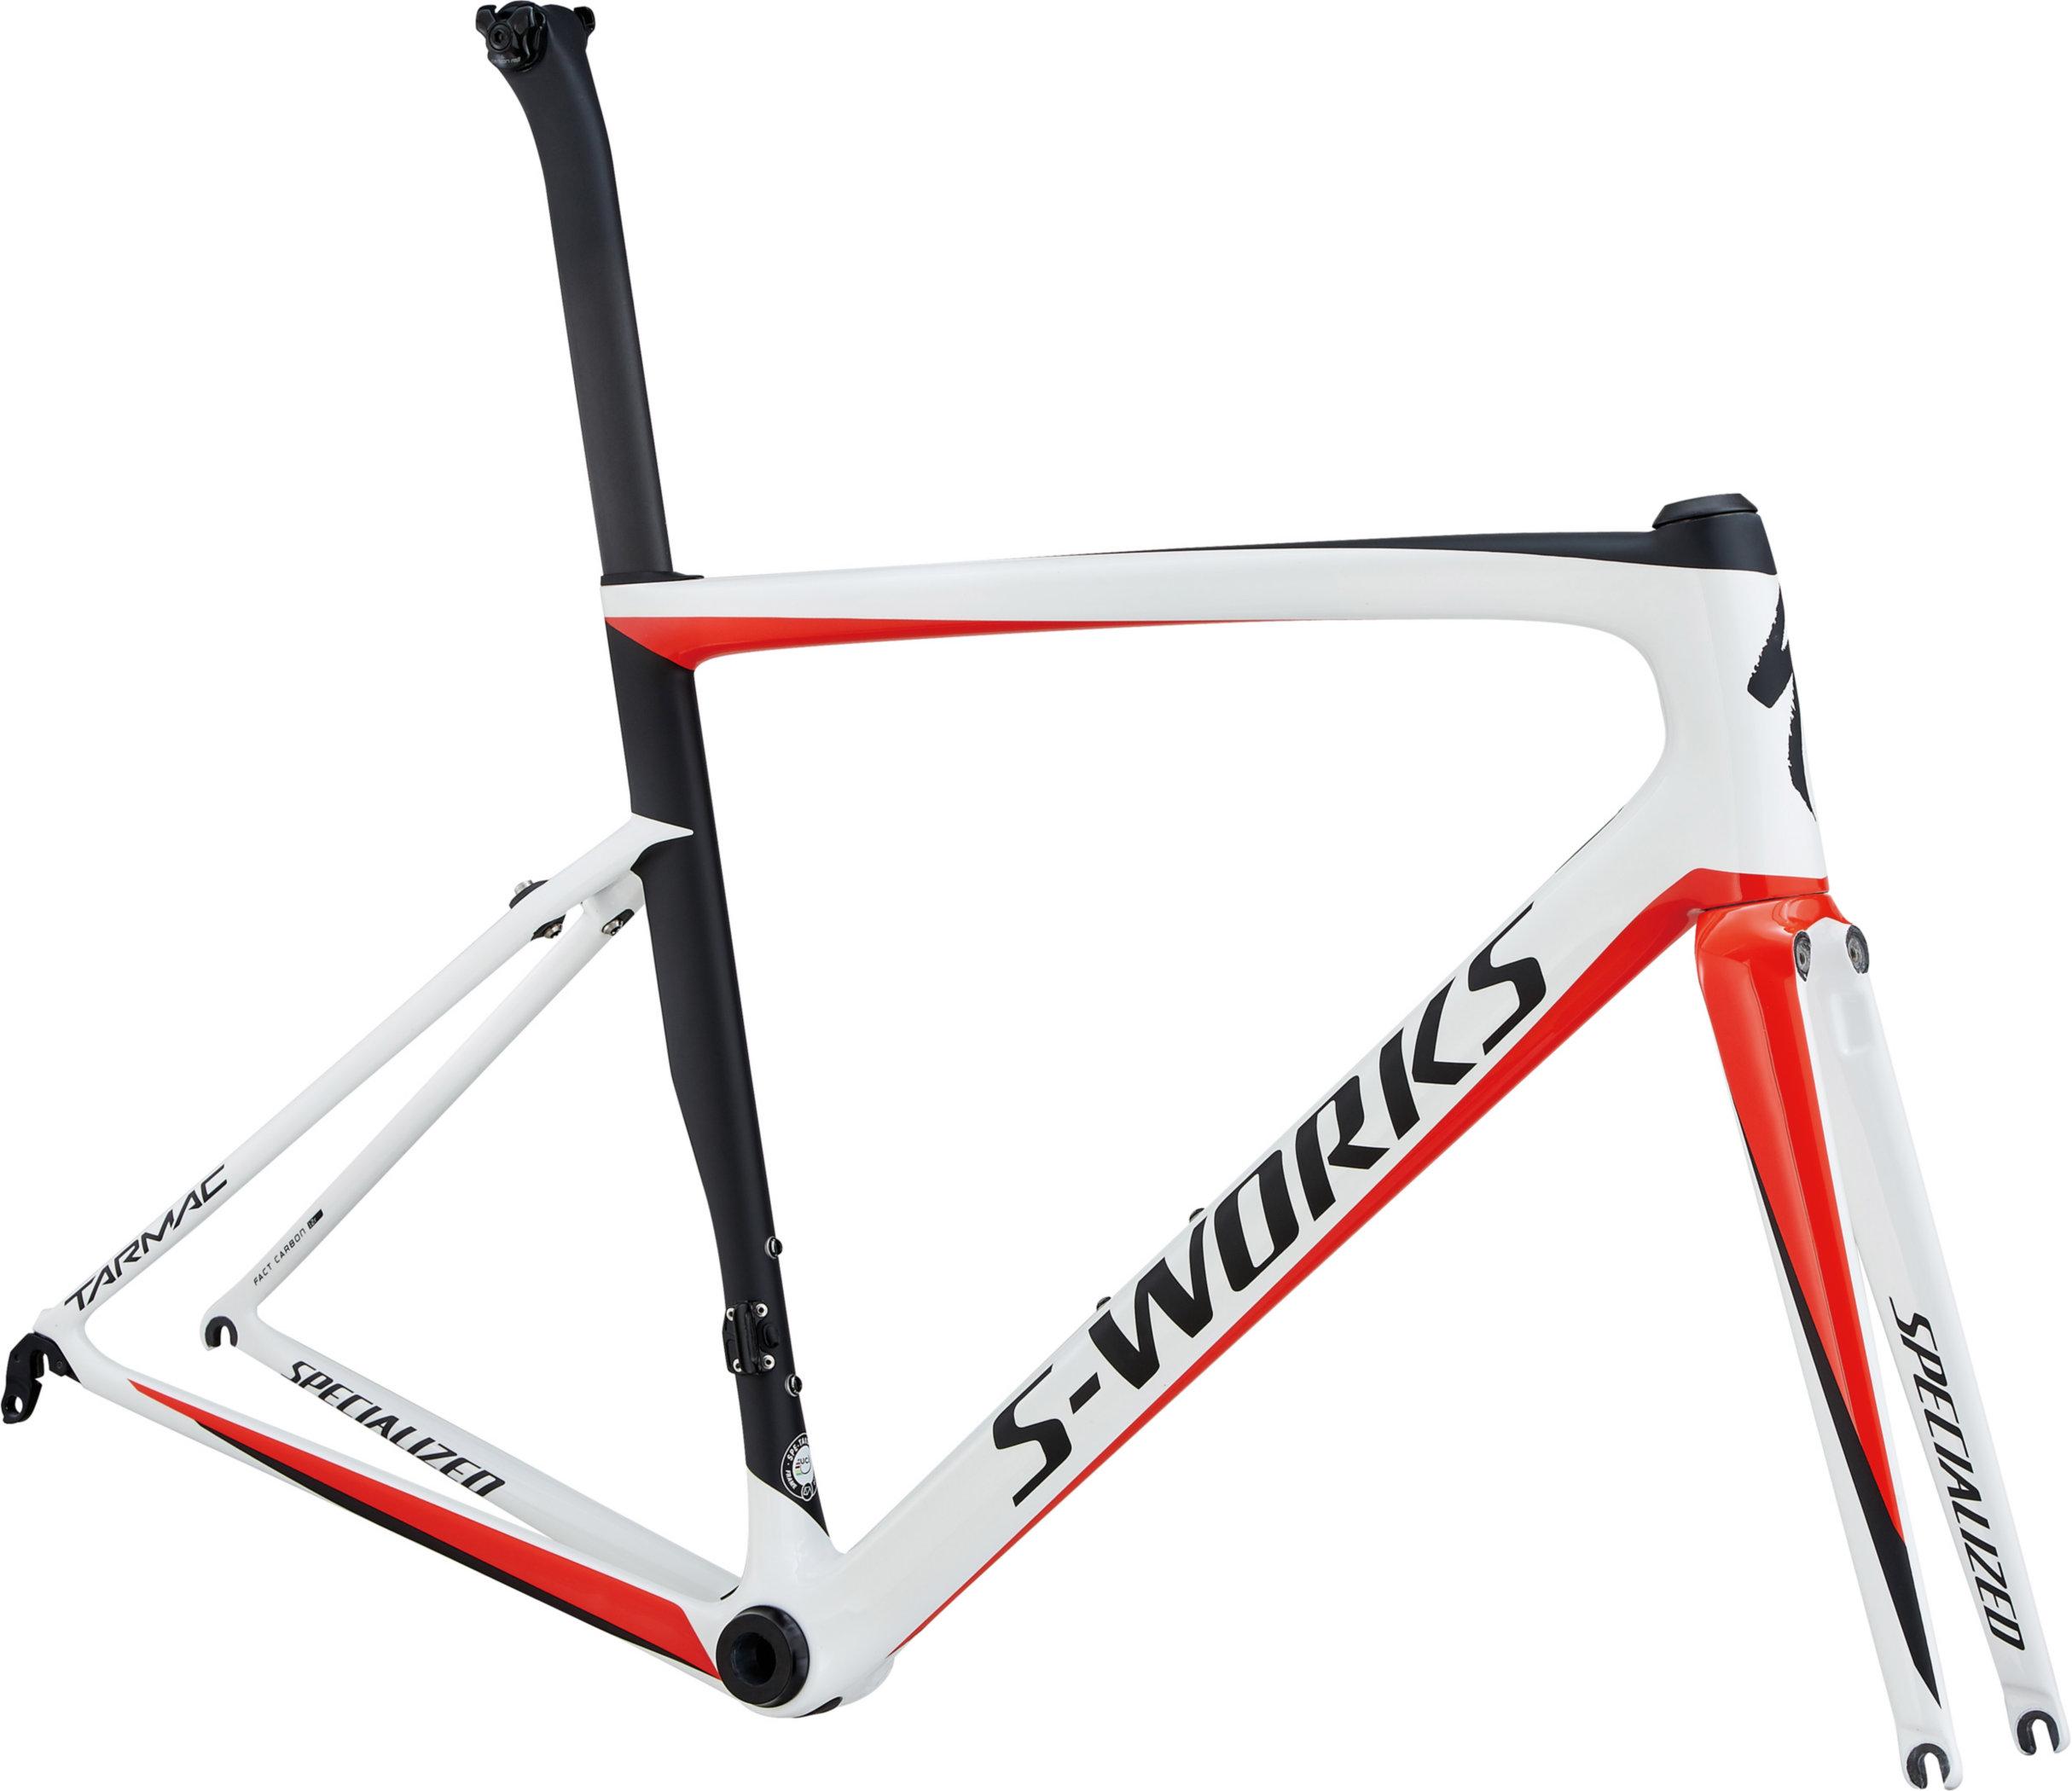 Specialized Men´s S-Works Tarmac Frameset Light White/Rocket Red/Satin Black 54 - Specialized Men´s S-Works Tarmac Frameset Light White/Rocket Red/Satin Black 54